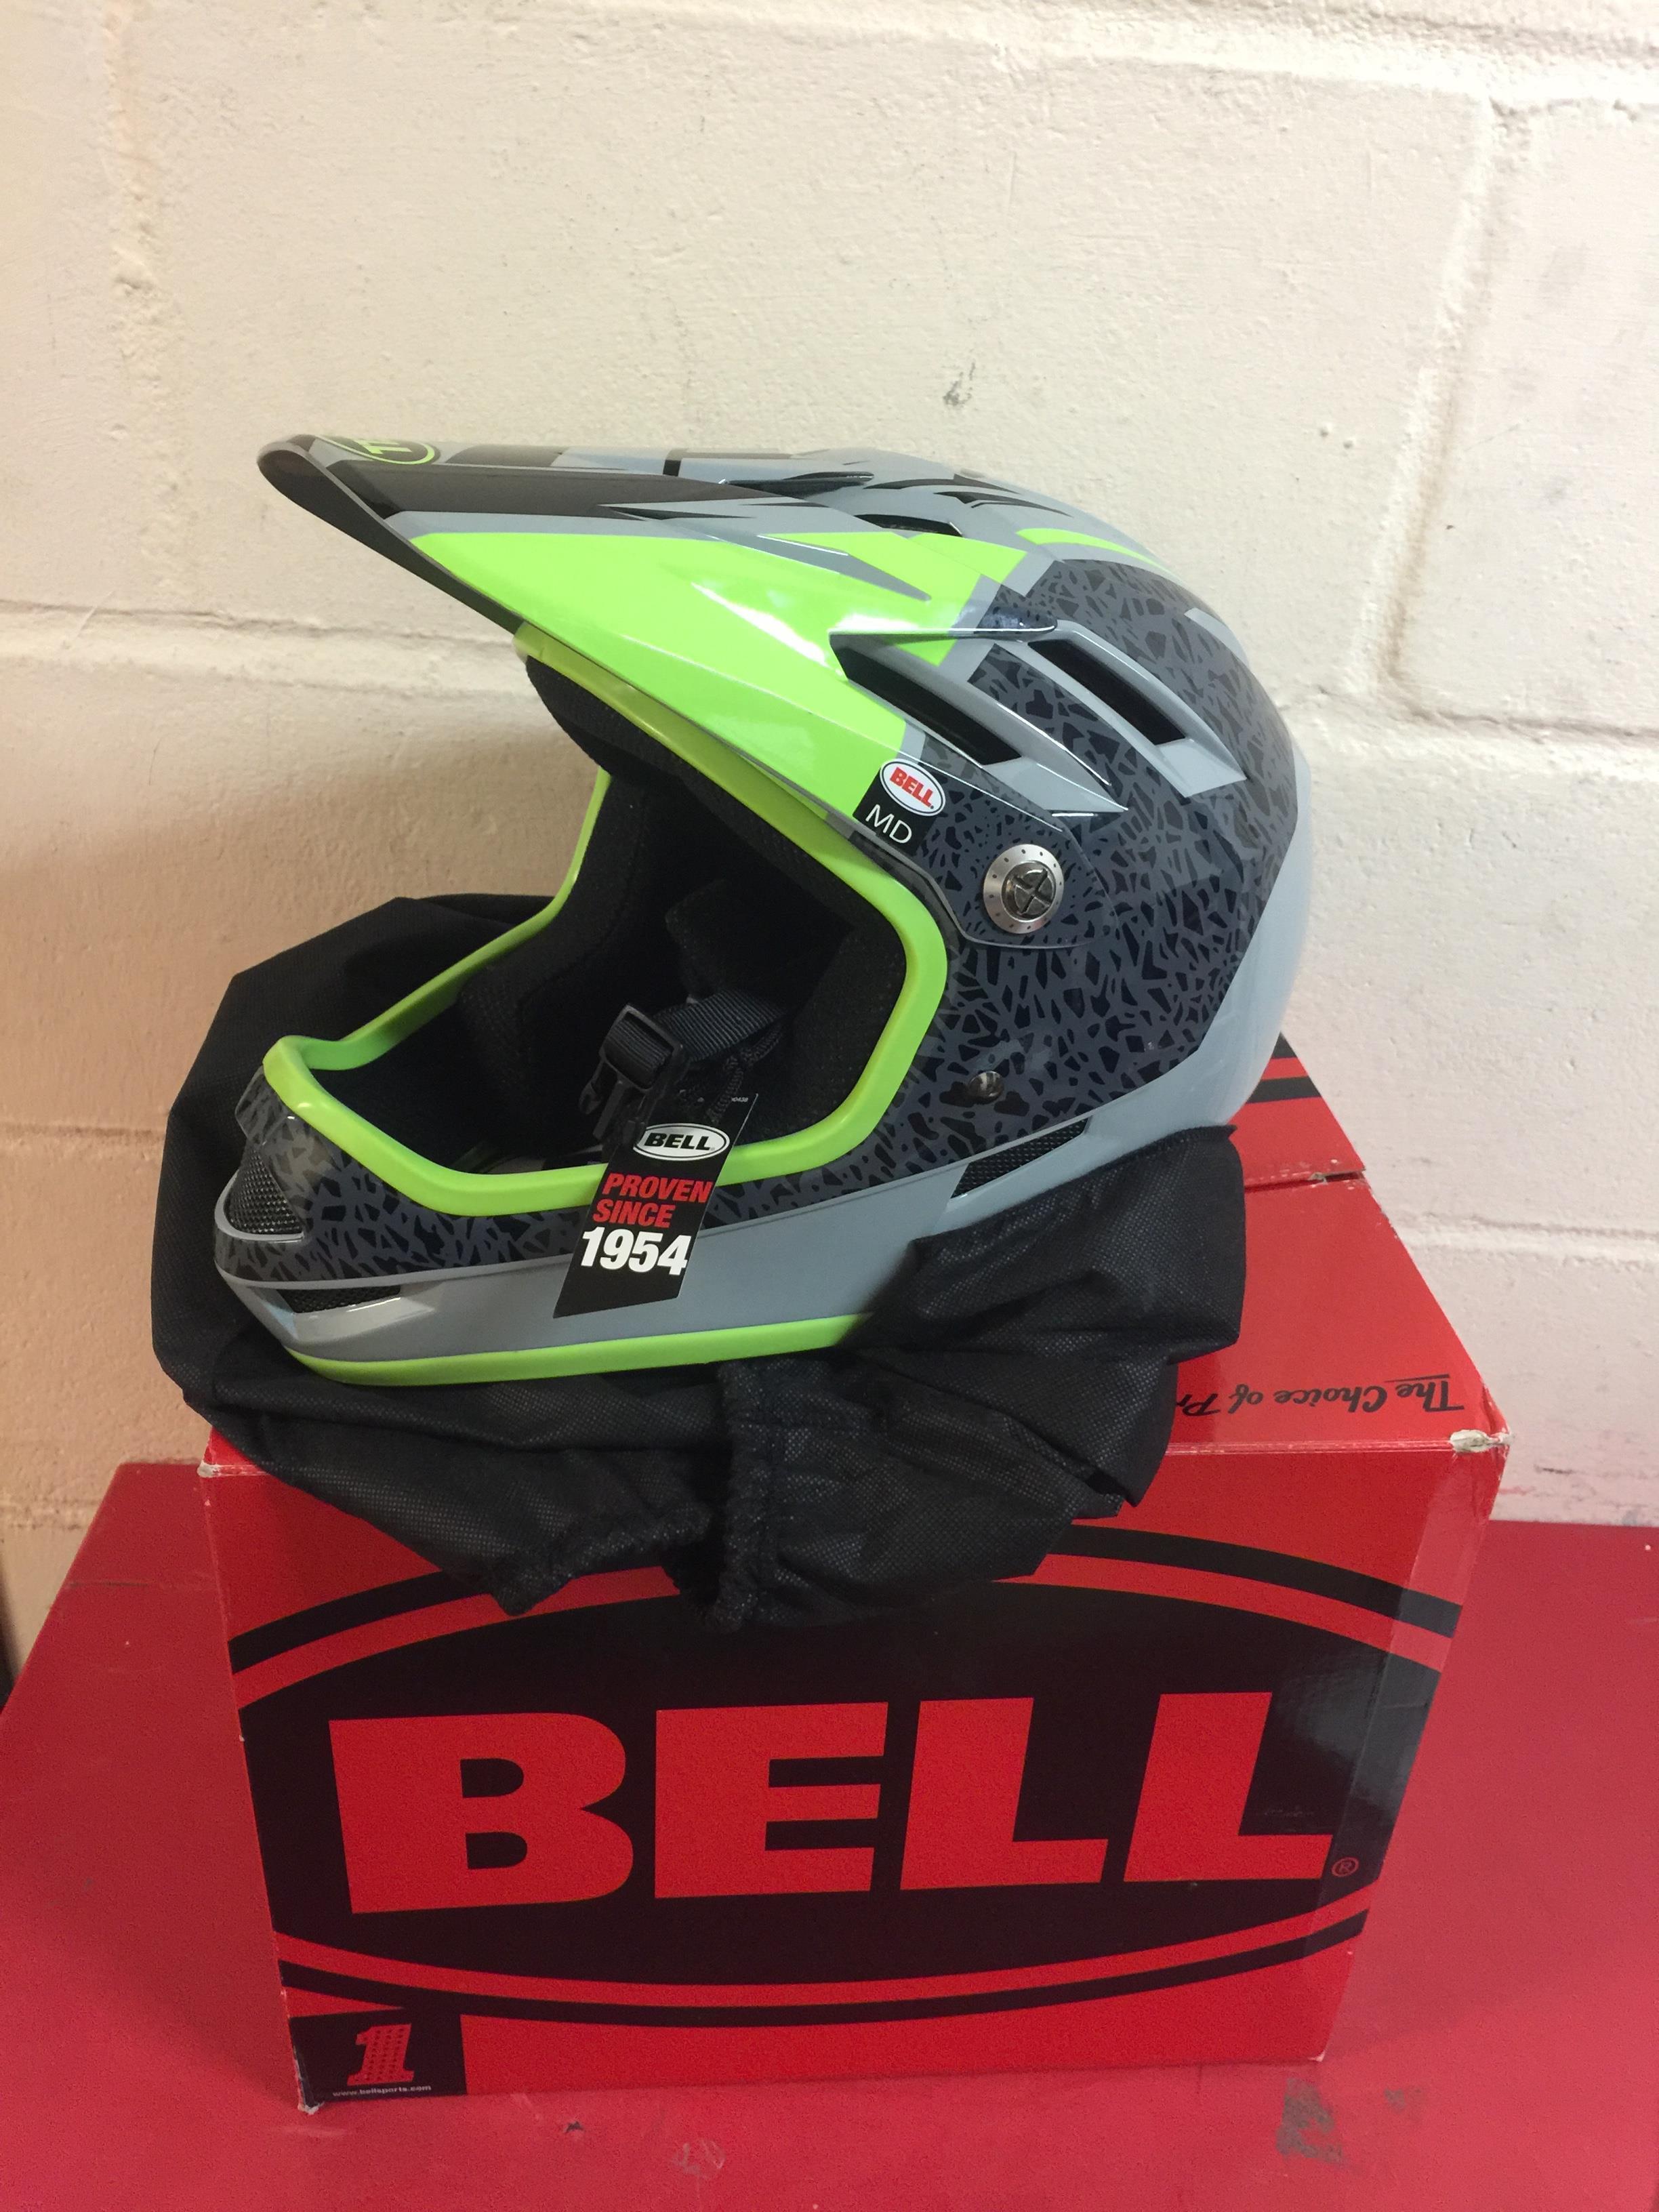 Lot 19 - Bell Gloss Smoke-pear REPERATION 2018 Sanction MTB Full Face Helmet RRP £69.99